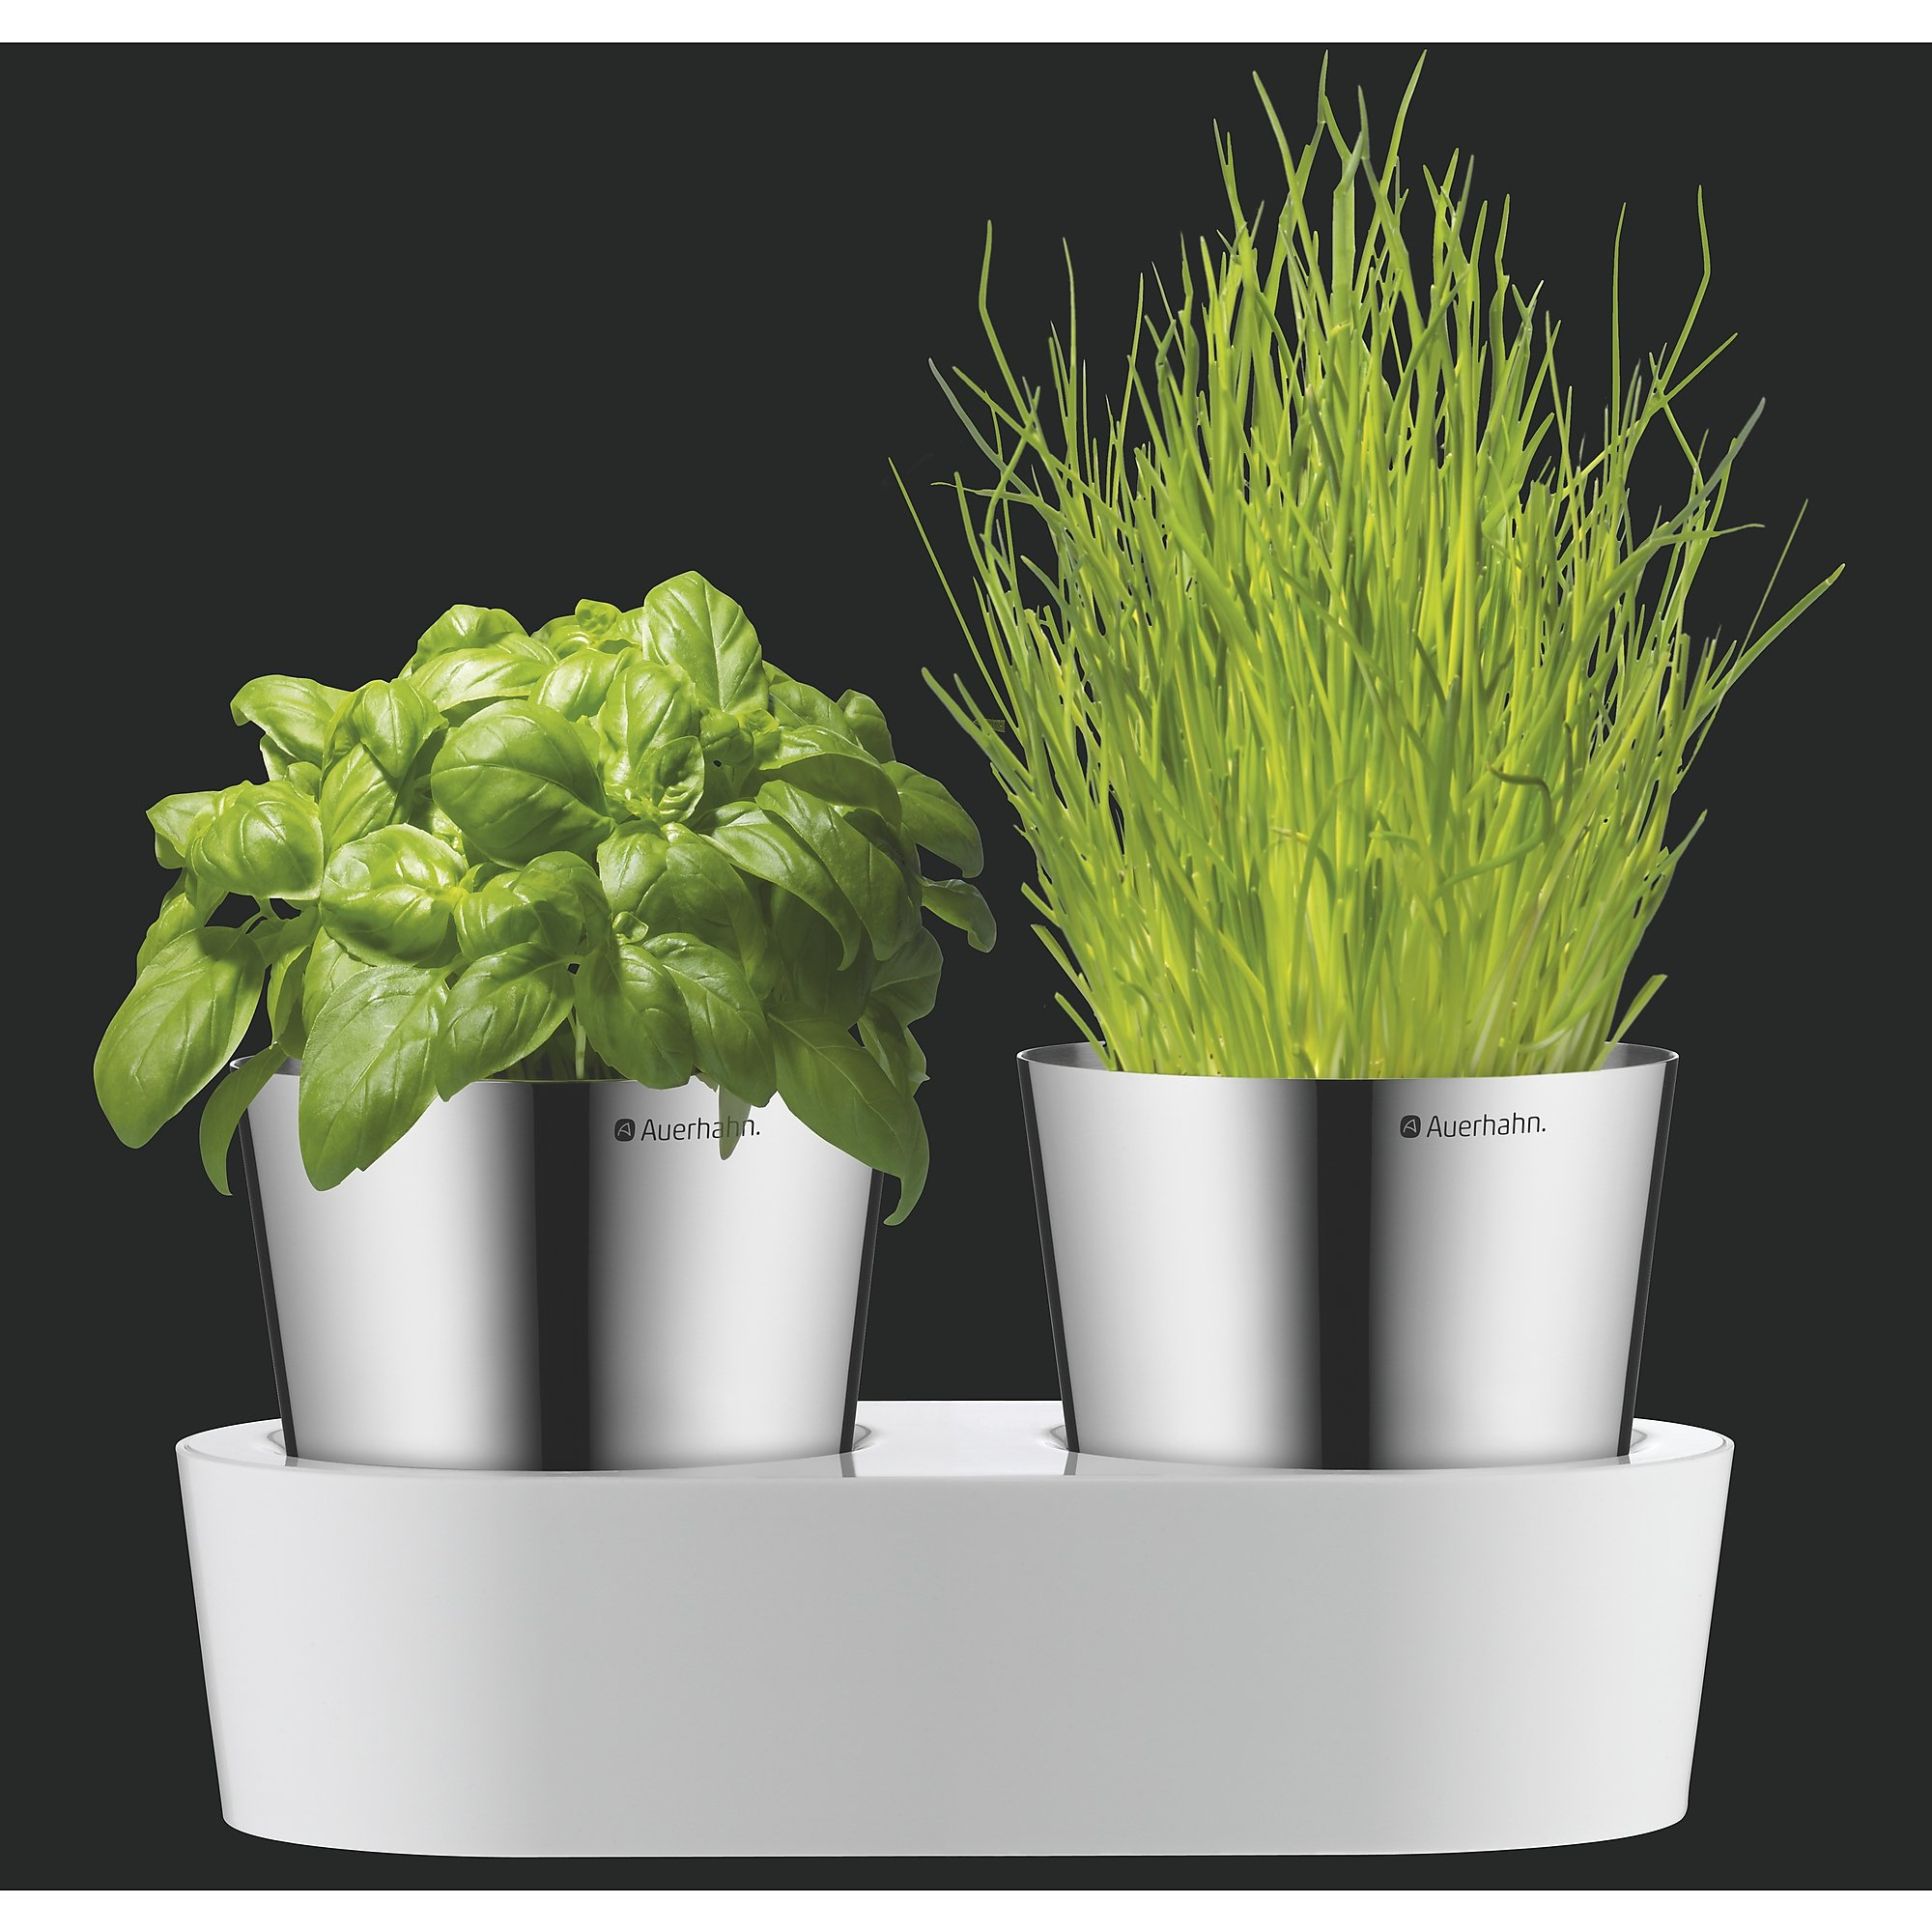 auerhahn 2430142520 herbs home kr utergarten 2 er set wei k che haushalt. Black Bedroom Furniture Sets. Home Design Ideas